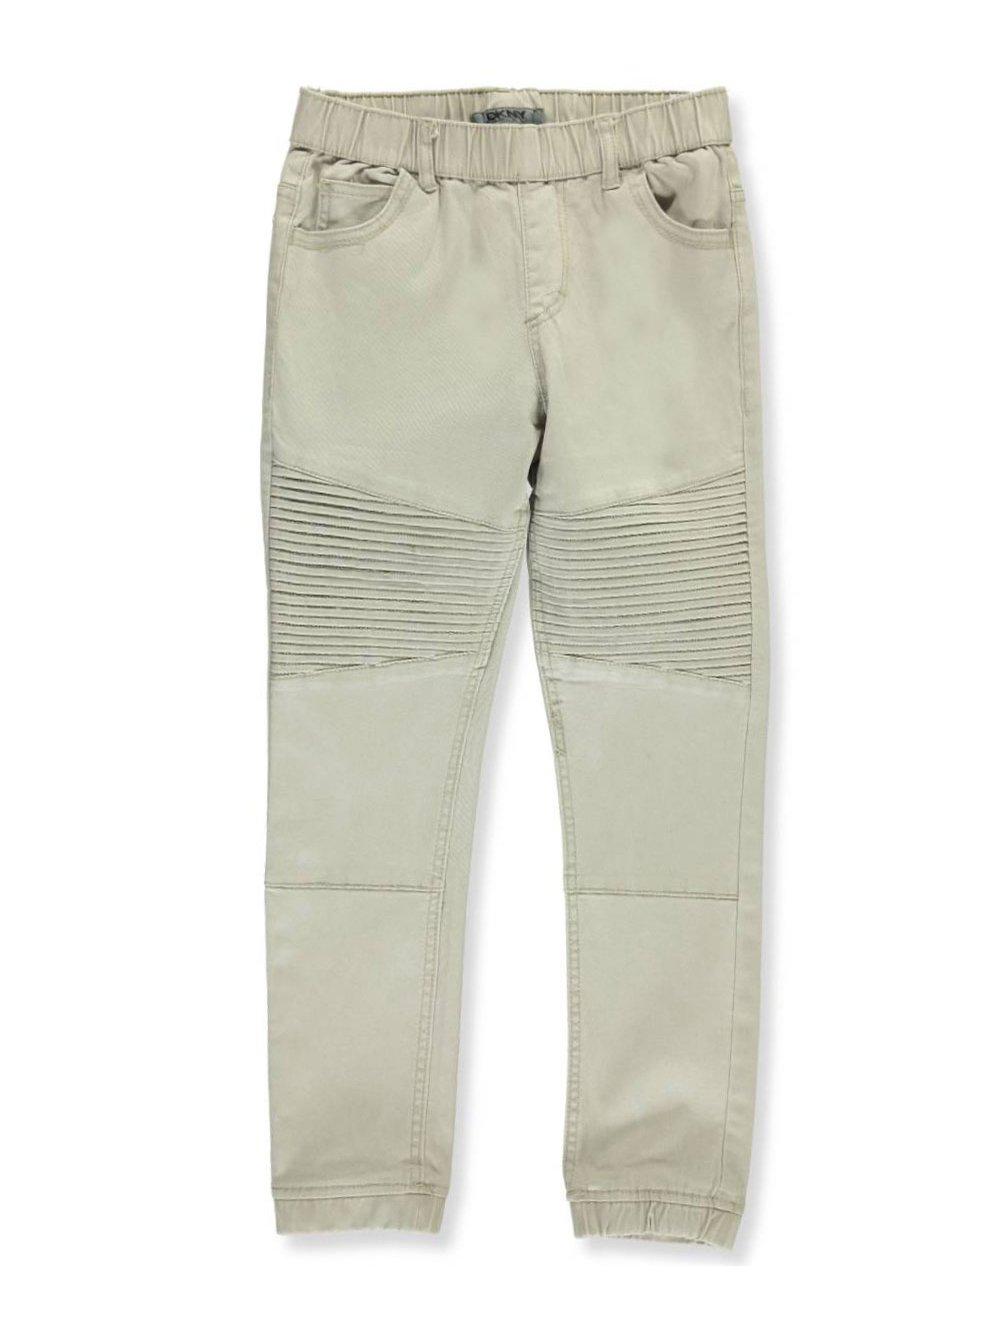 DKNY Big Boys' Twill Pant (More Styles Available), Aluminum, 10/12